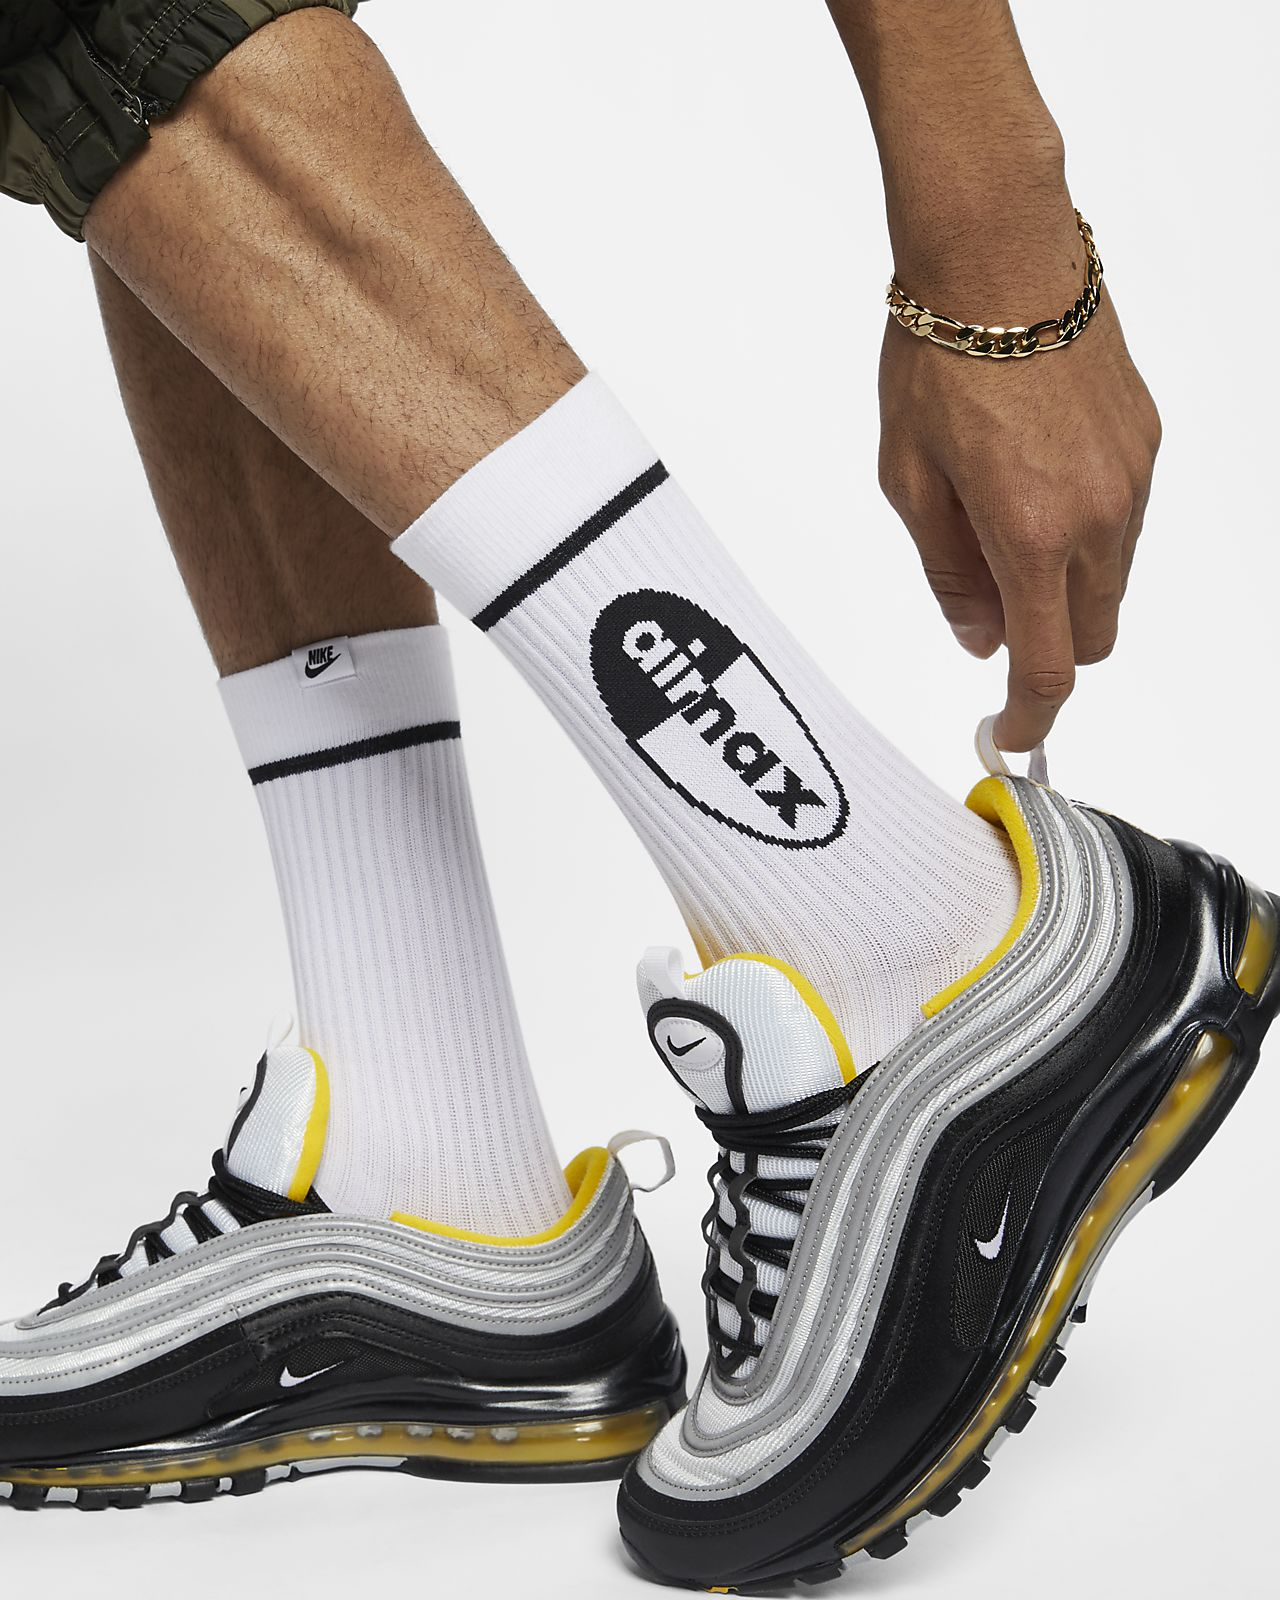 Calcetines deportivos Nike Air Max (2 pares)